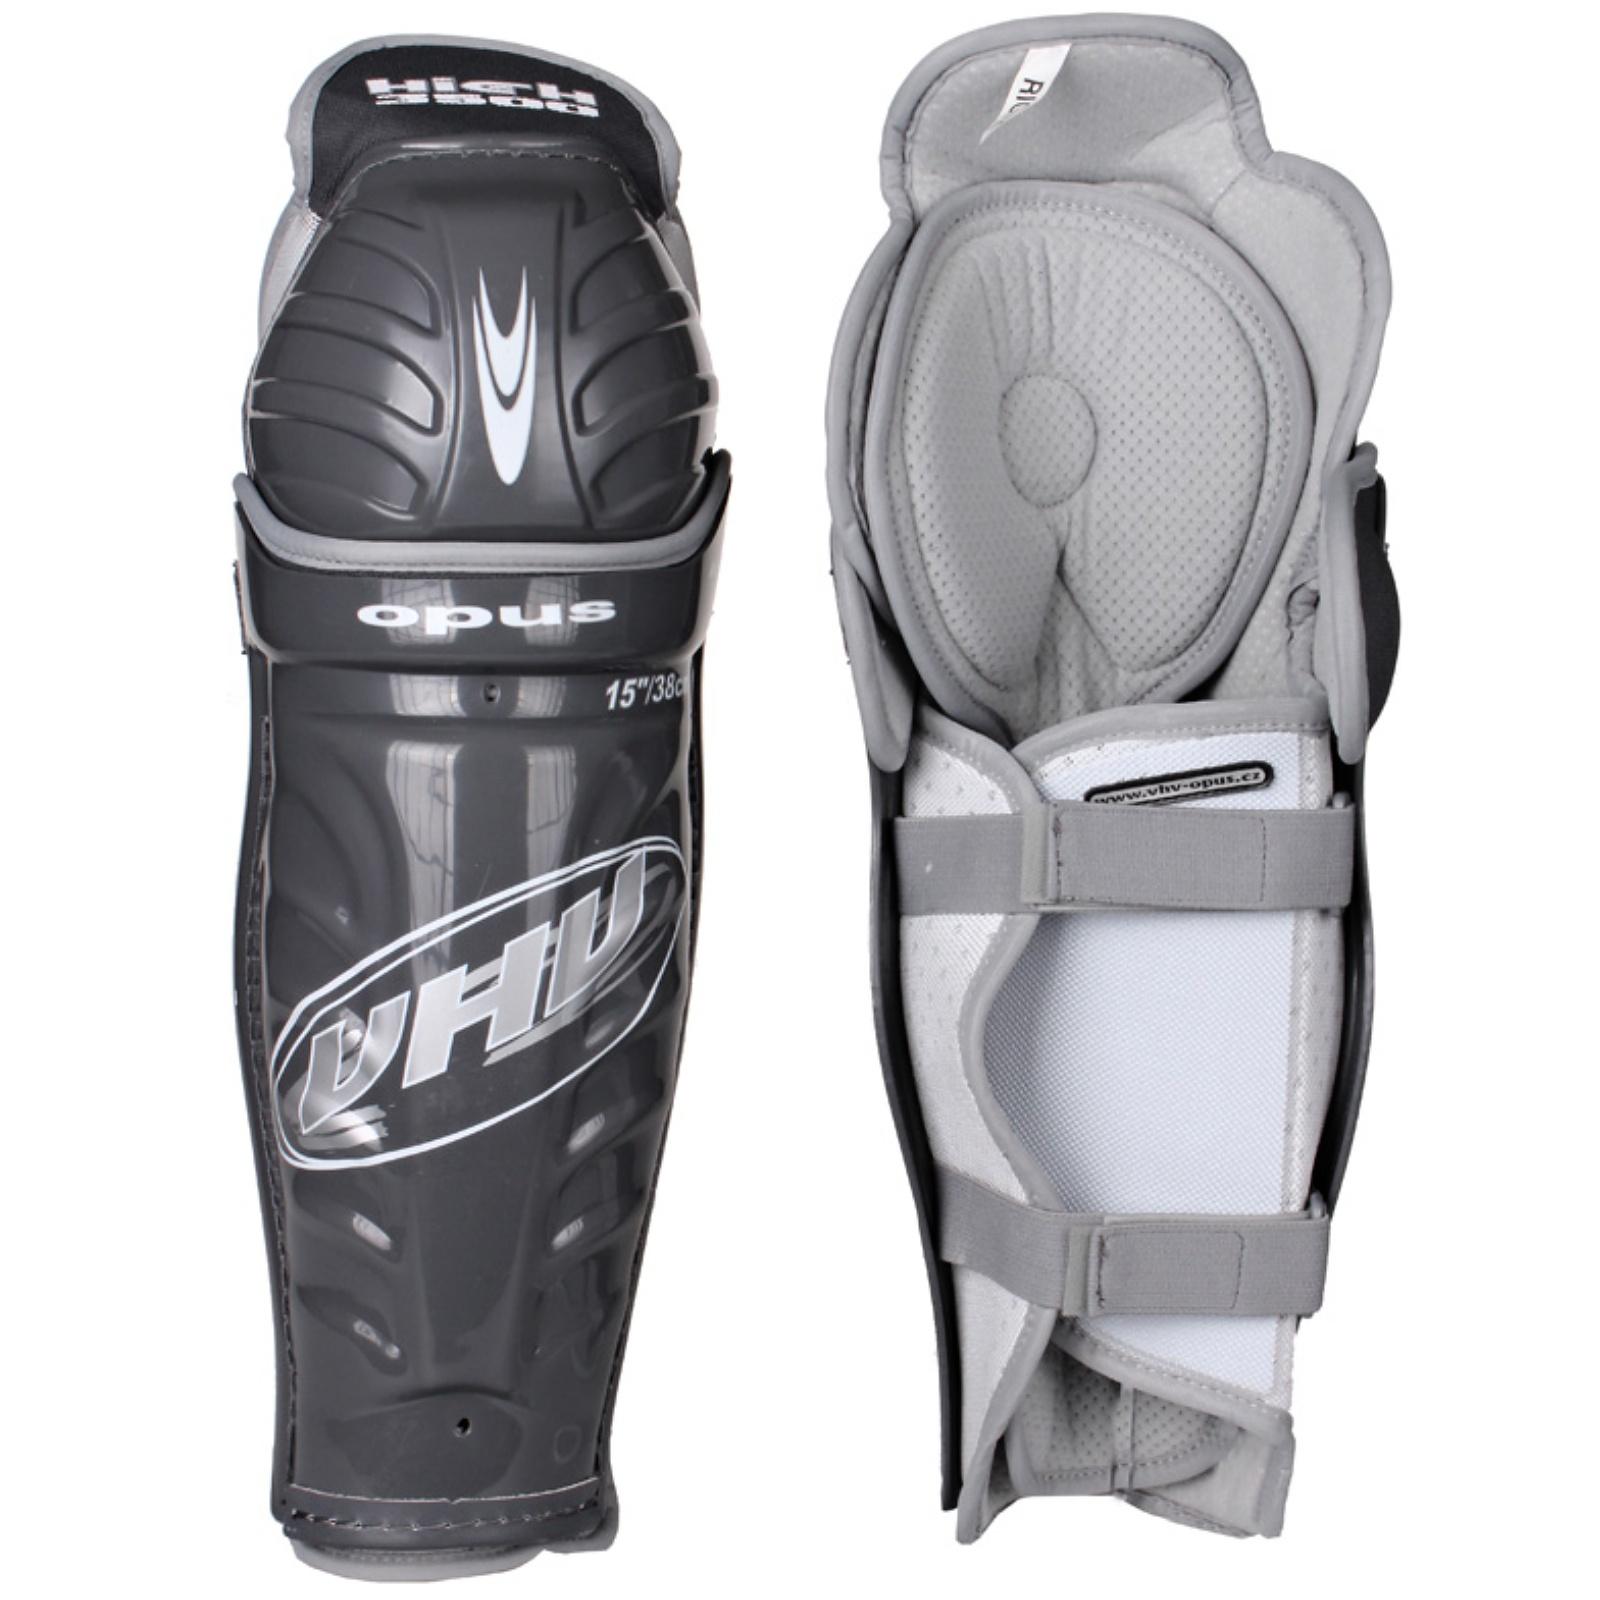 Hokejový chránič holení OPUS 3694 High 3500 SR - vel. 15''